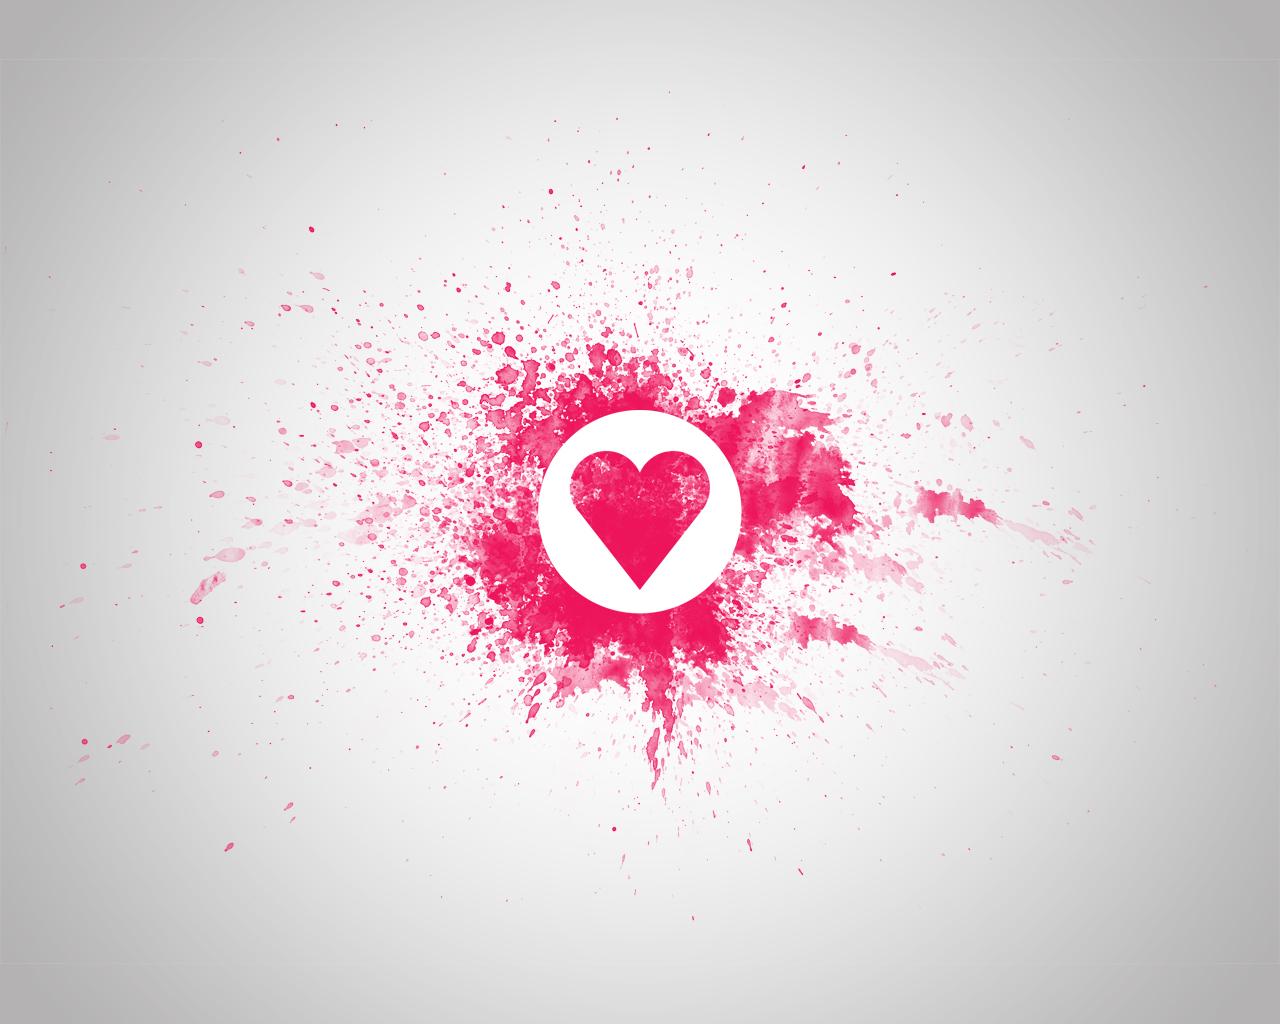 5 wallpaper hd para mujeres just luxury guide - Best heart wallpaper hd ...